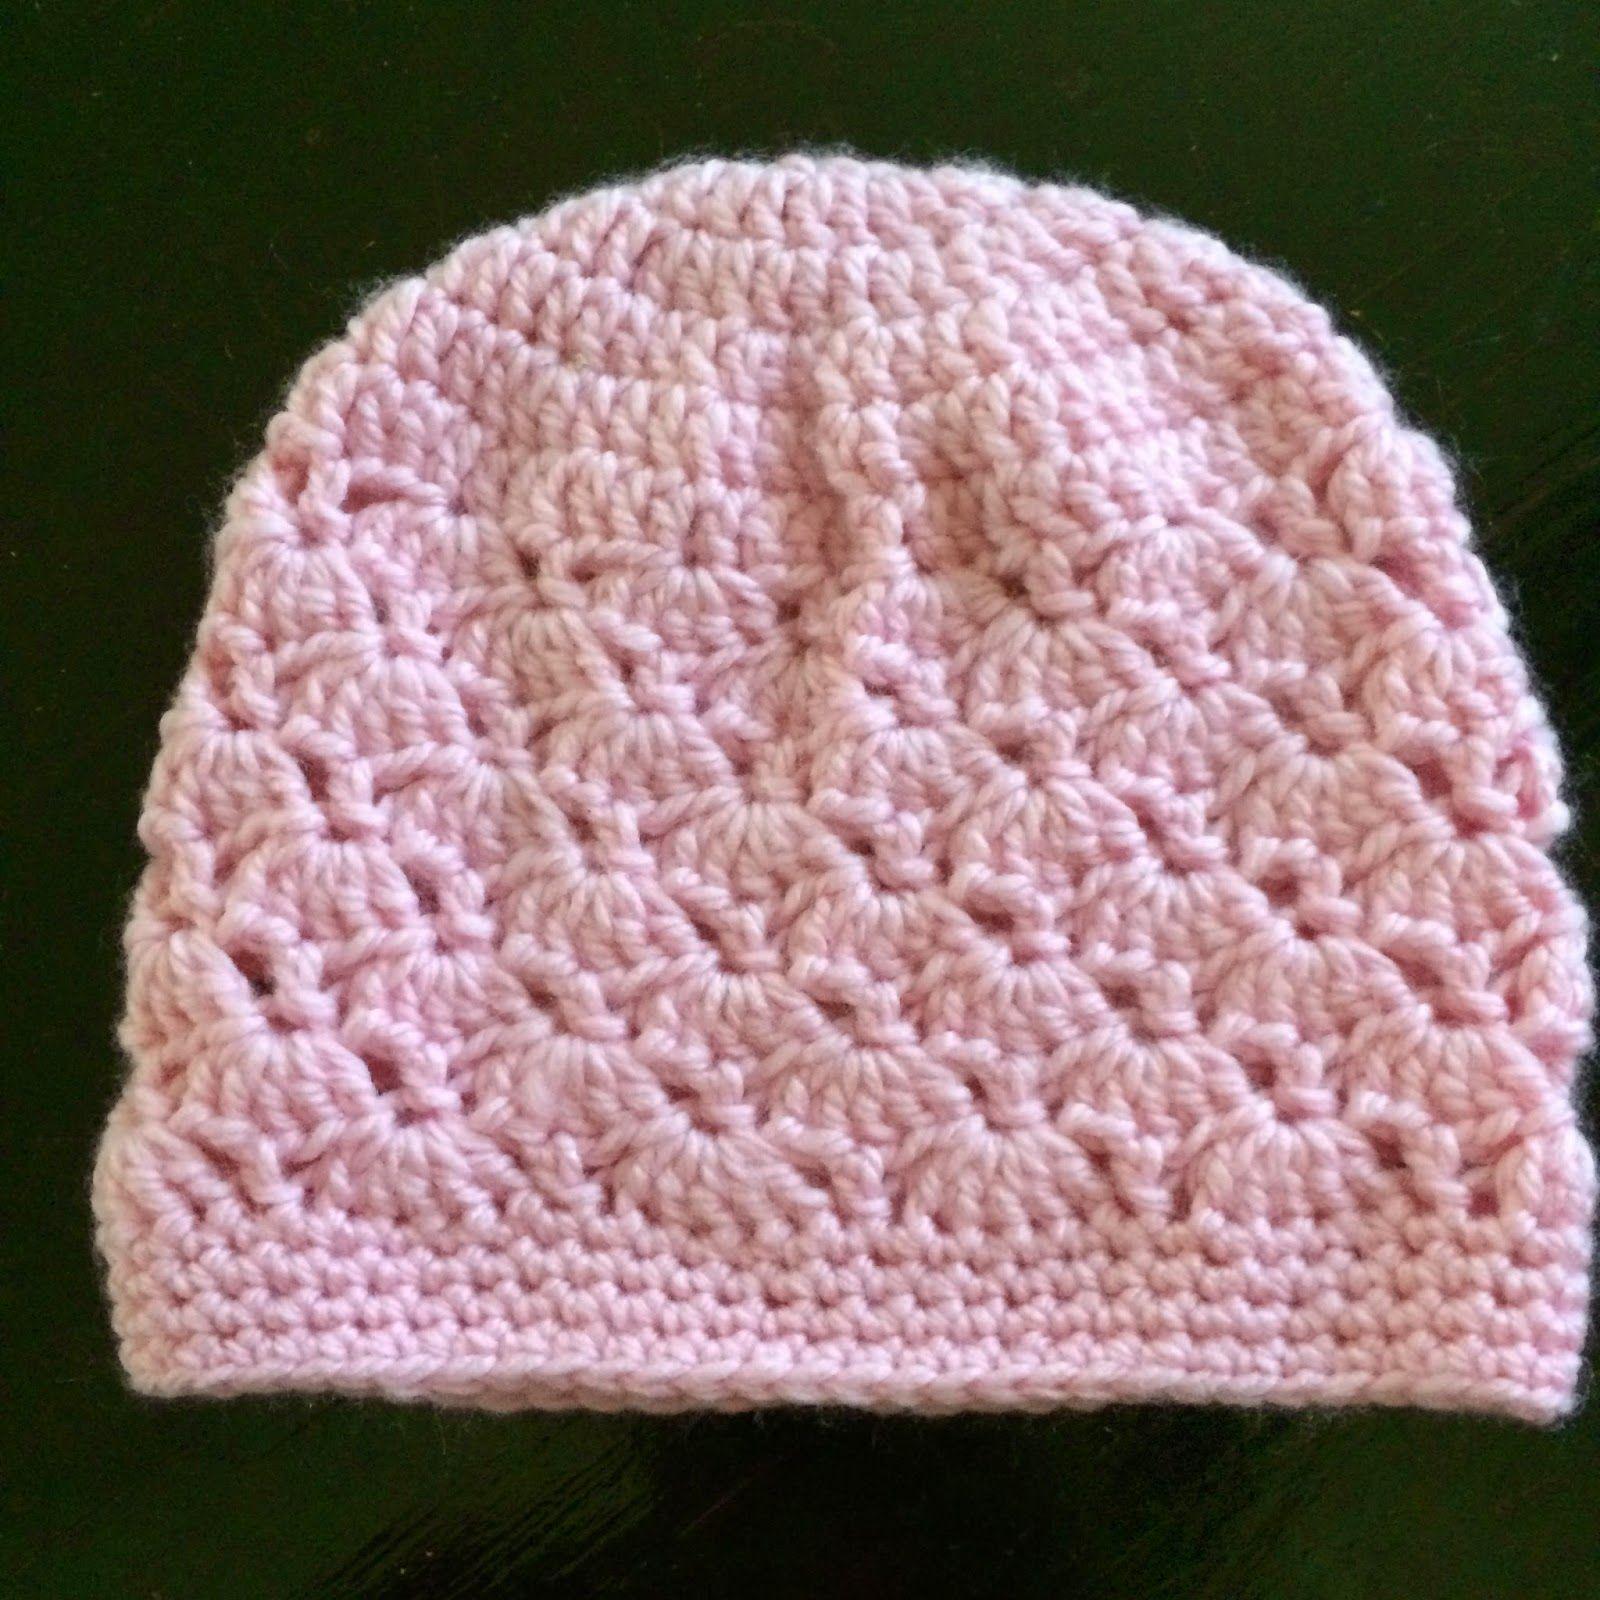 Not My Nana\'s Crochet!: Crochet Chemo Cap 2 - Free Pattern | crochet ...